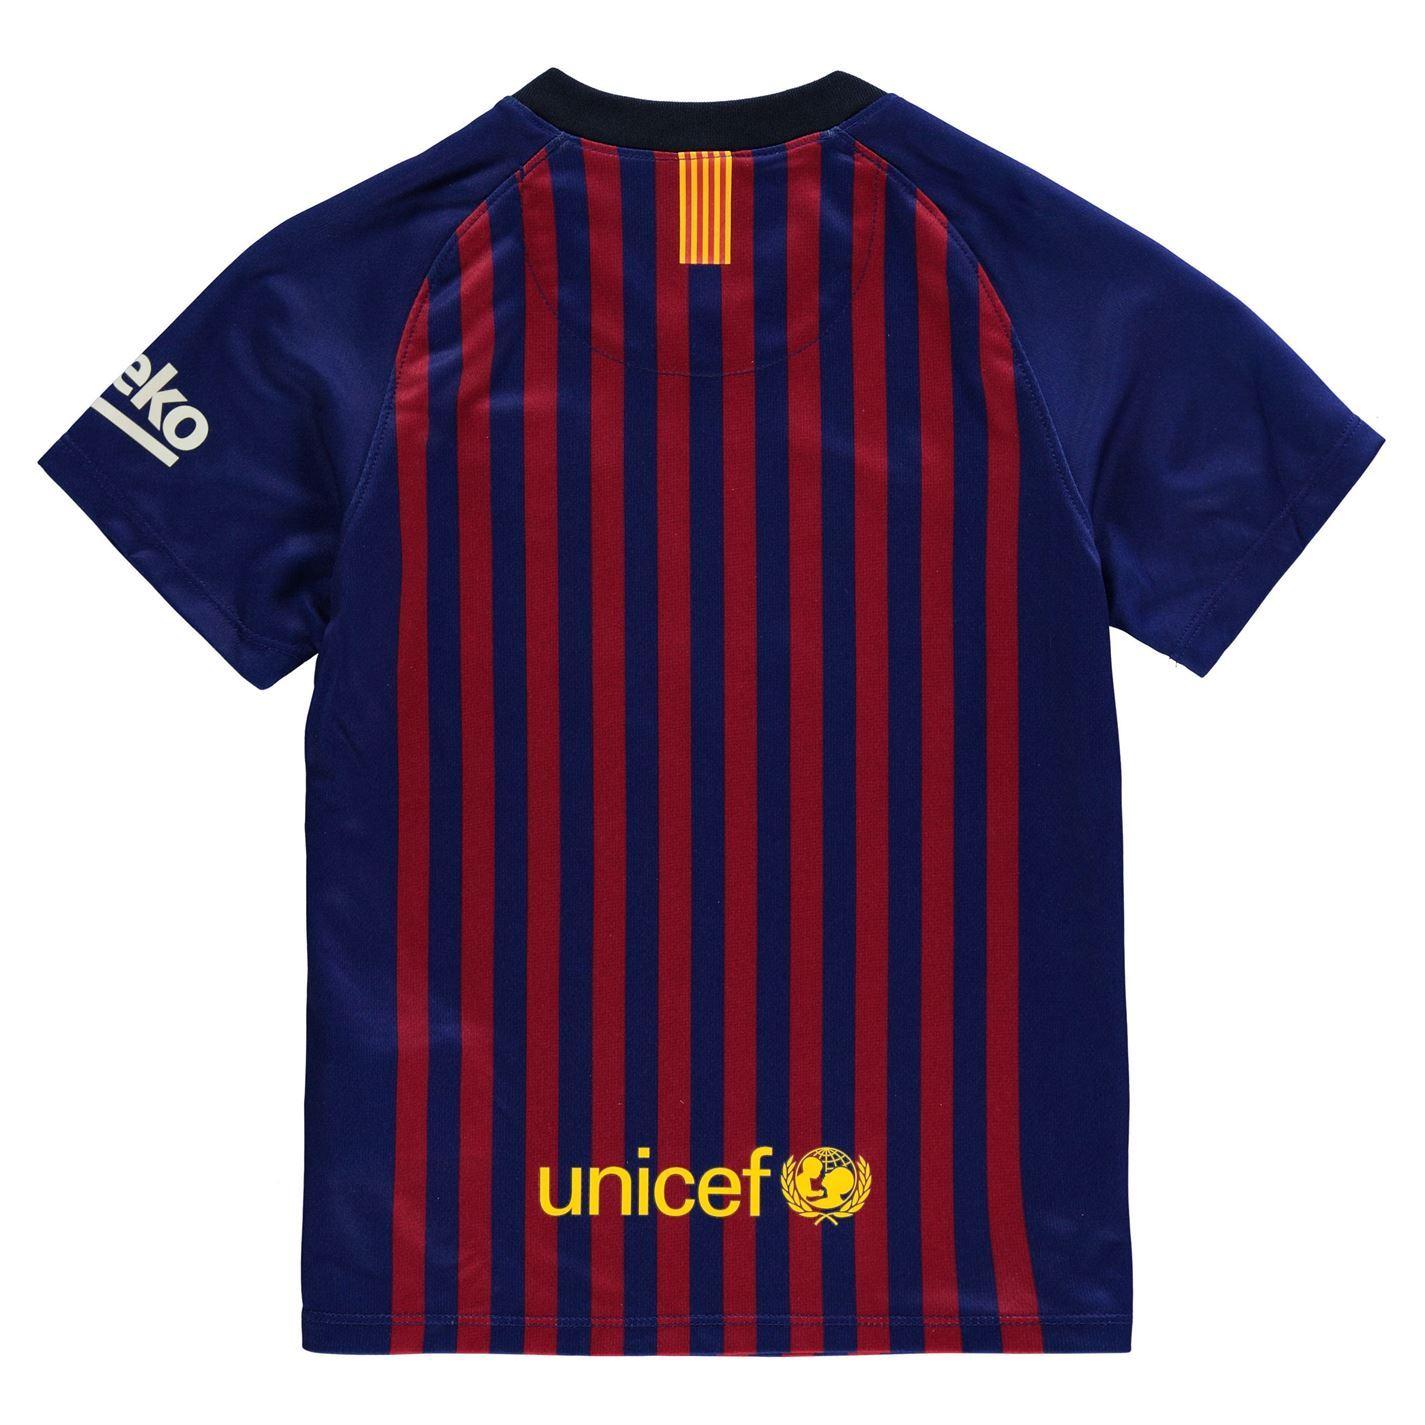 4bf680ecdd2 ... Nike Barcelona Home Jersey 2018 2019 Juniors Blue Red Football Soccer  Shirt Top